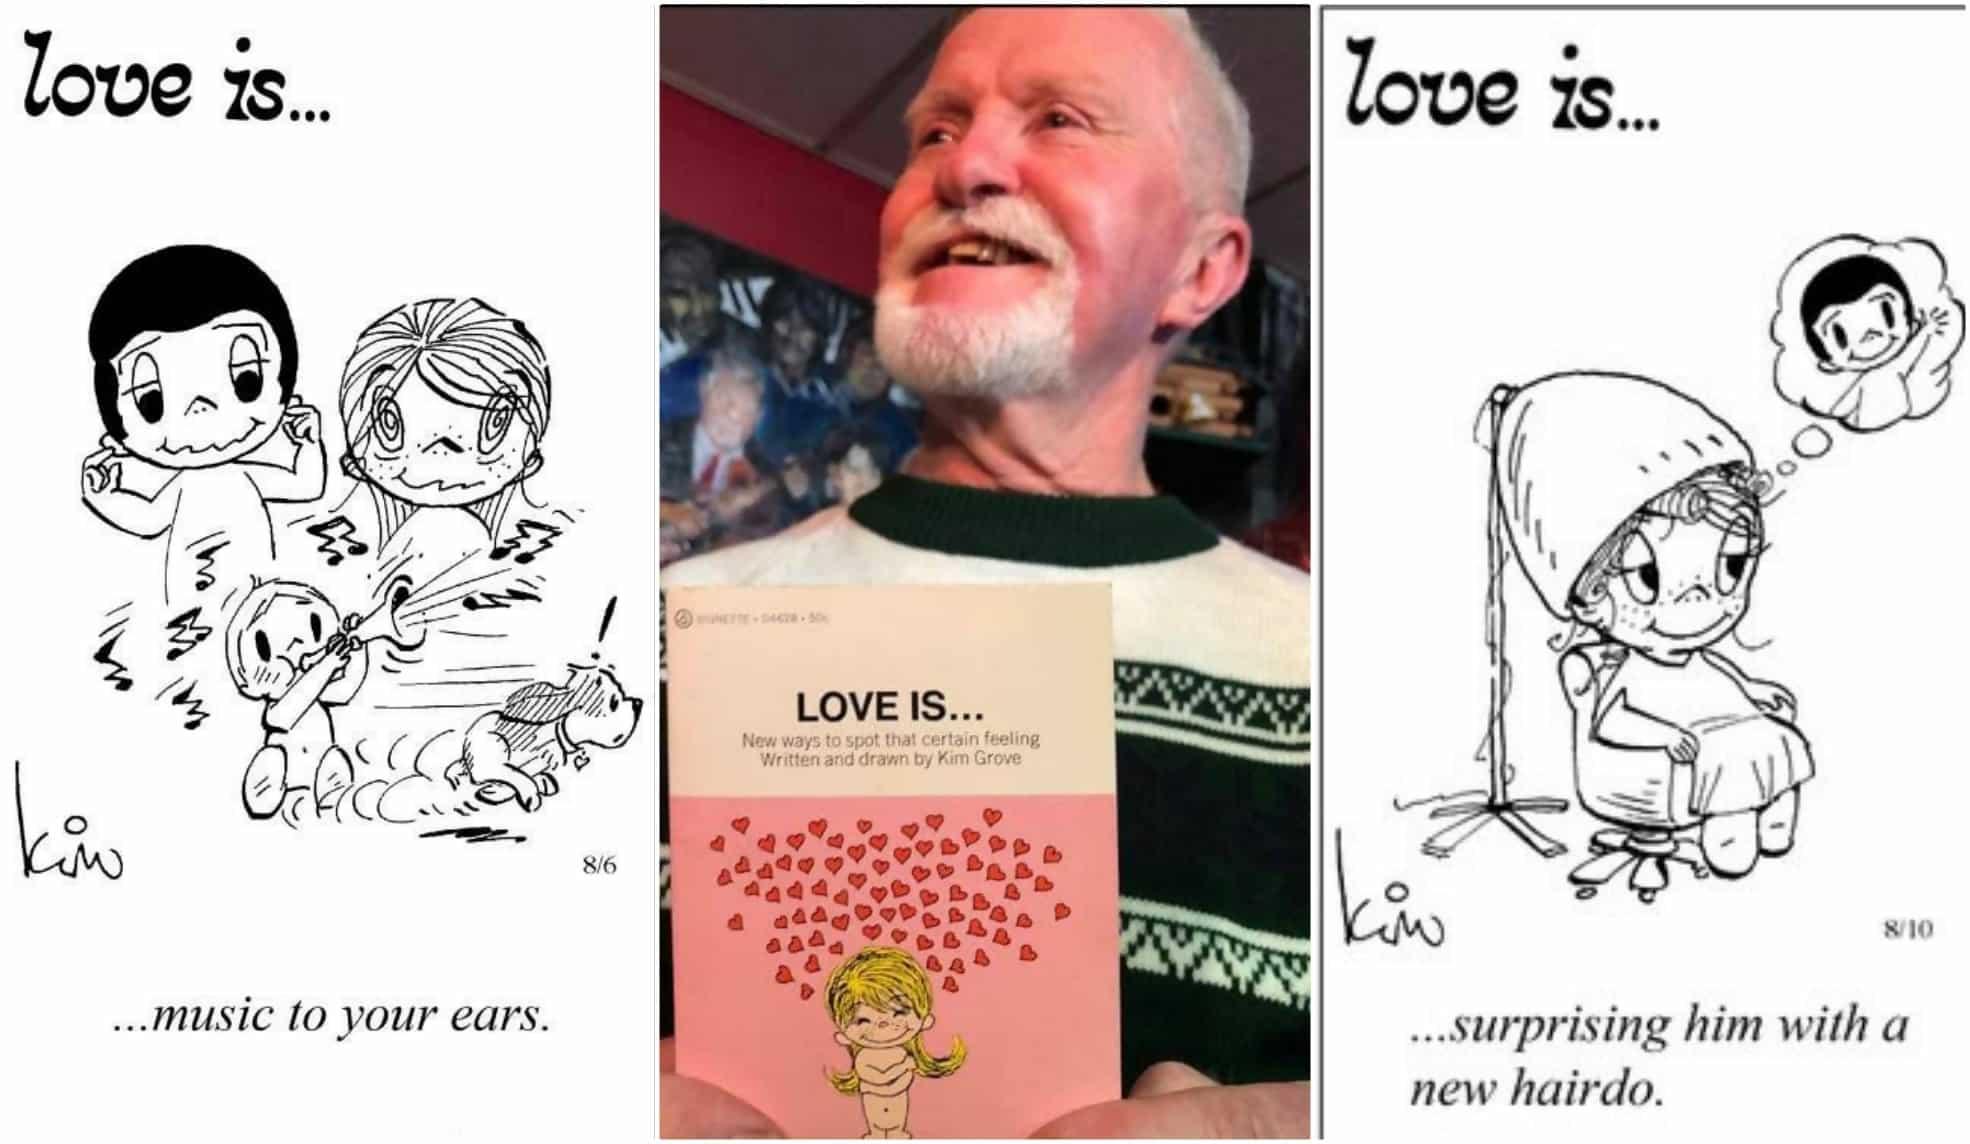 Macintosh HD:Users:brittanyloeffler:Downloads:Upwork:Christmas Gift:gift-105.jpg